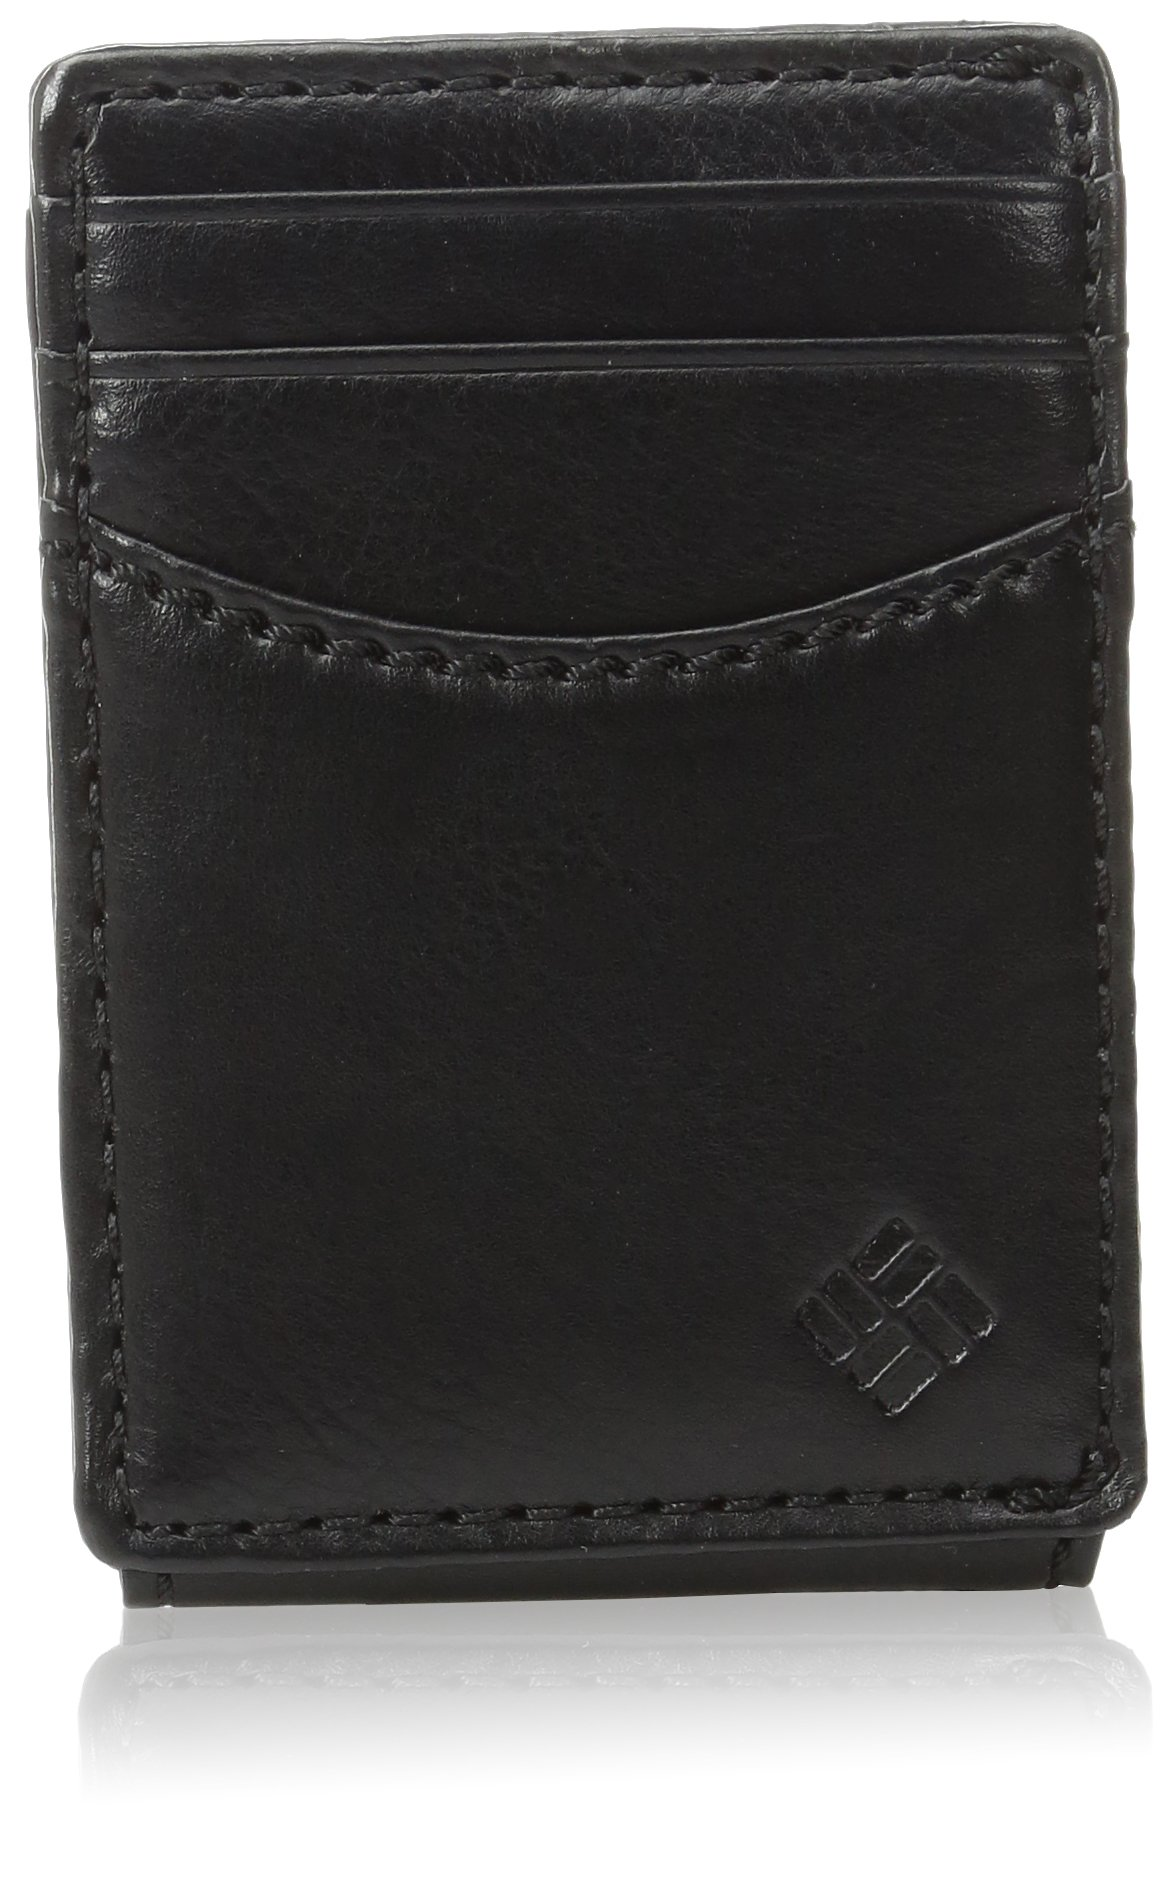 Columbia Security Blocking Pocket Wallet